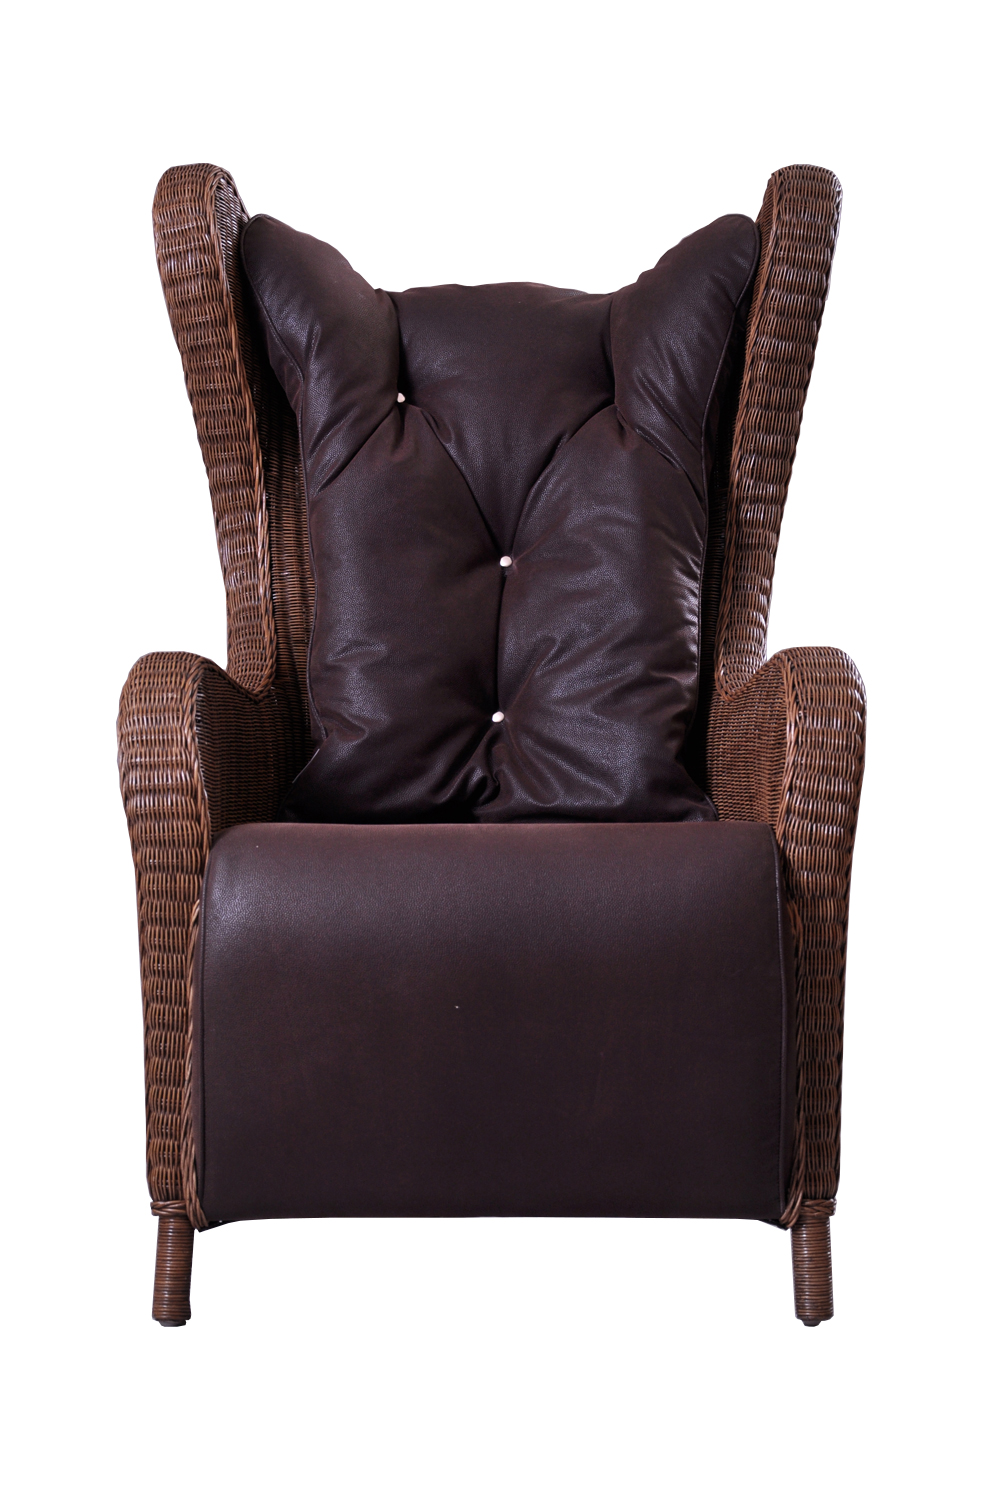 ohrensessel rattan alcantara fu hocker naturrattan sessel. Black Bedroom Furniture Sets. Home Design Ideas